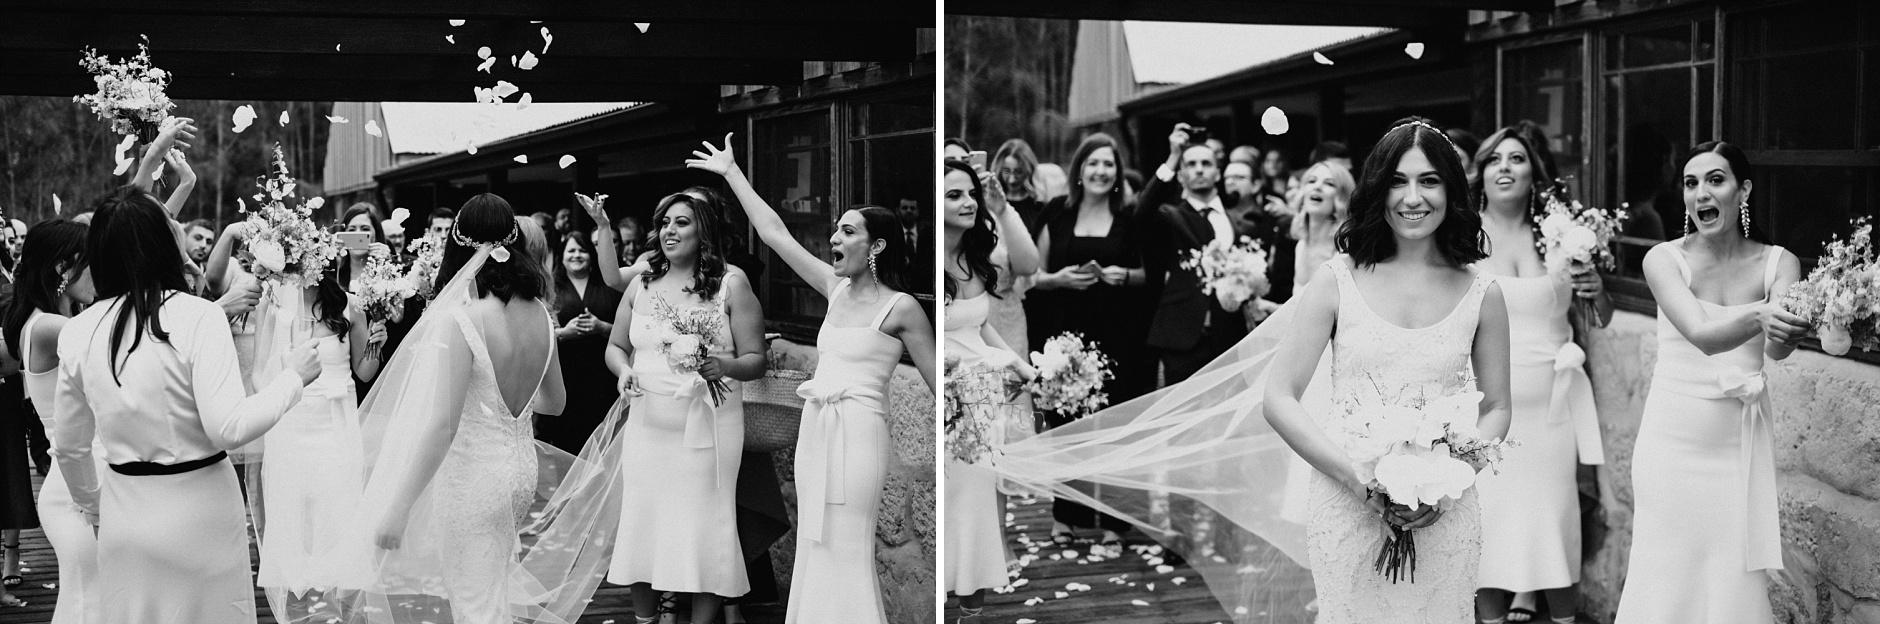 cassandra&cameron0329ab_Peppers-Creek-Wedding.jpg